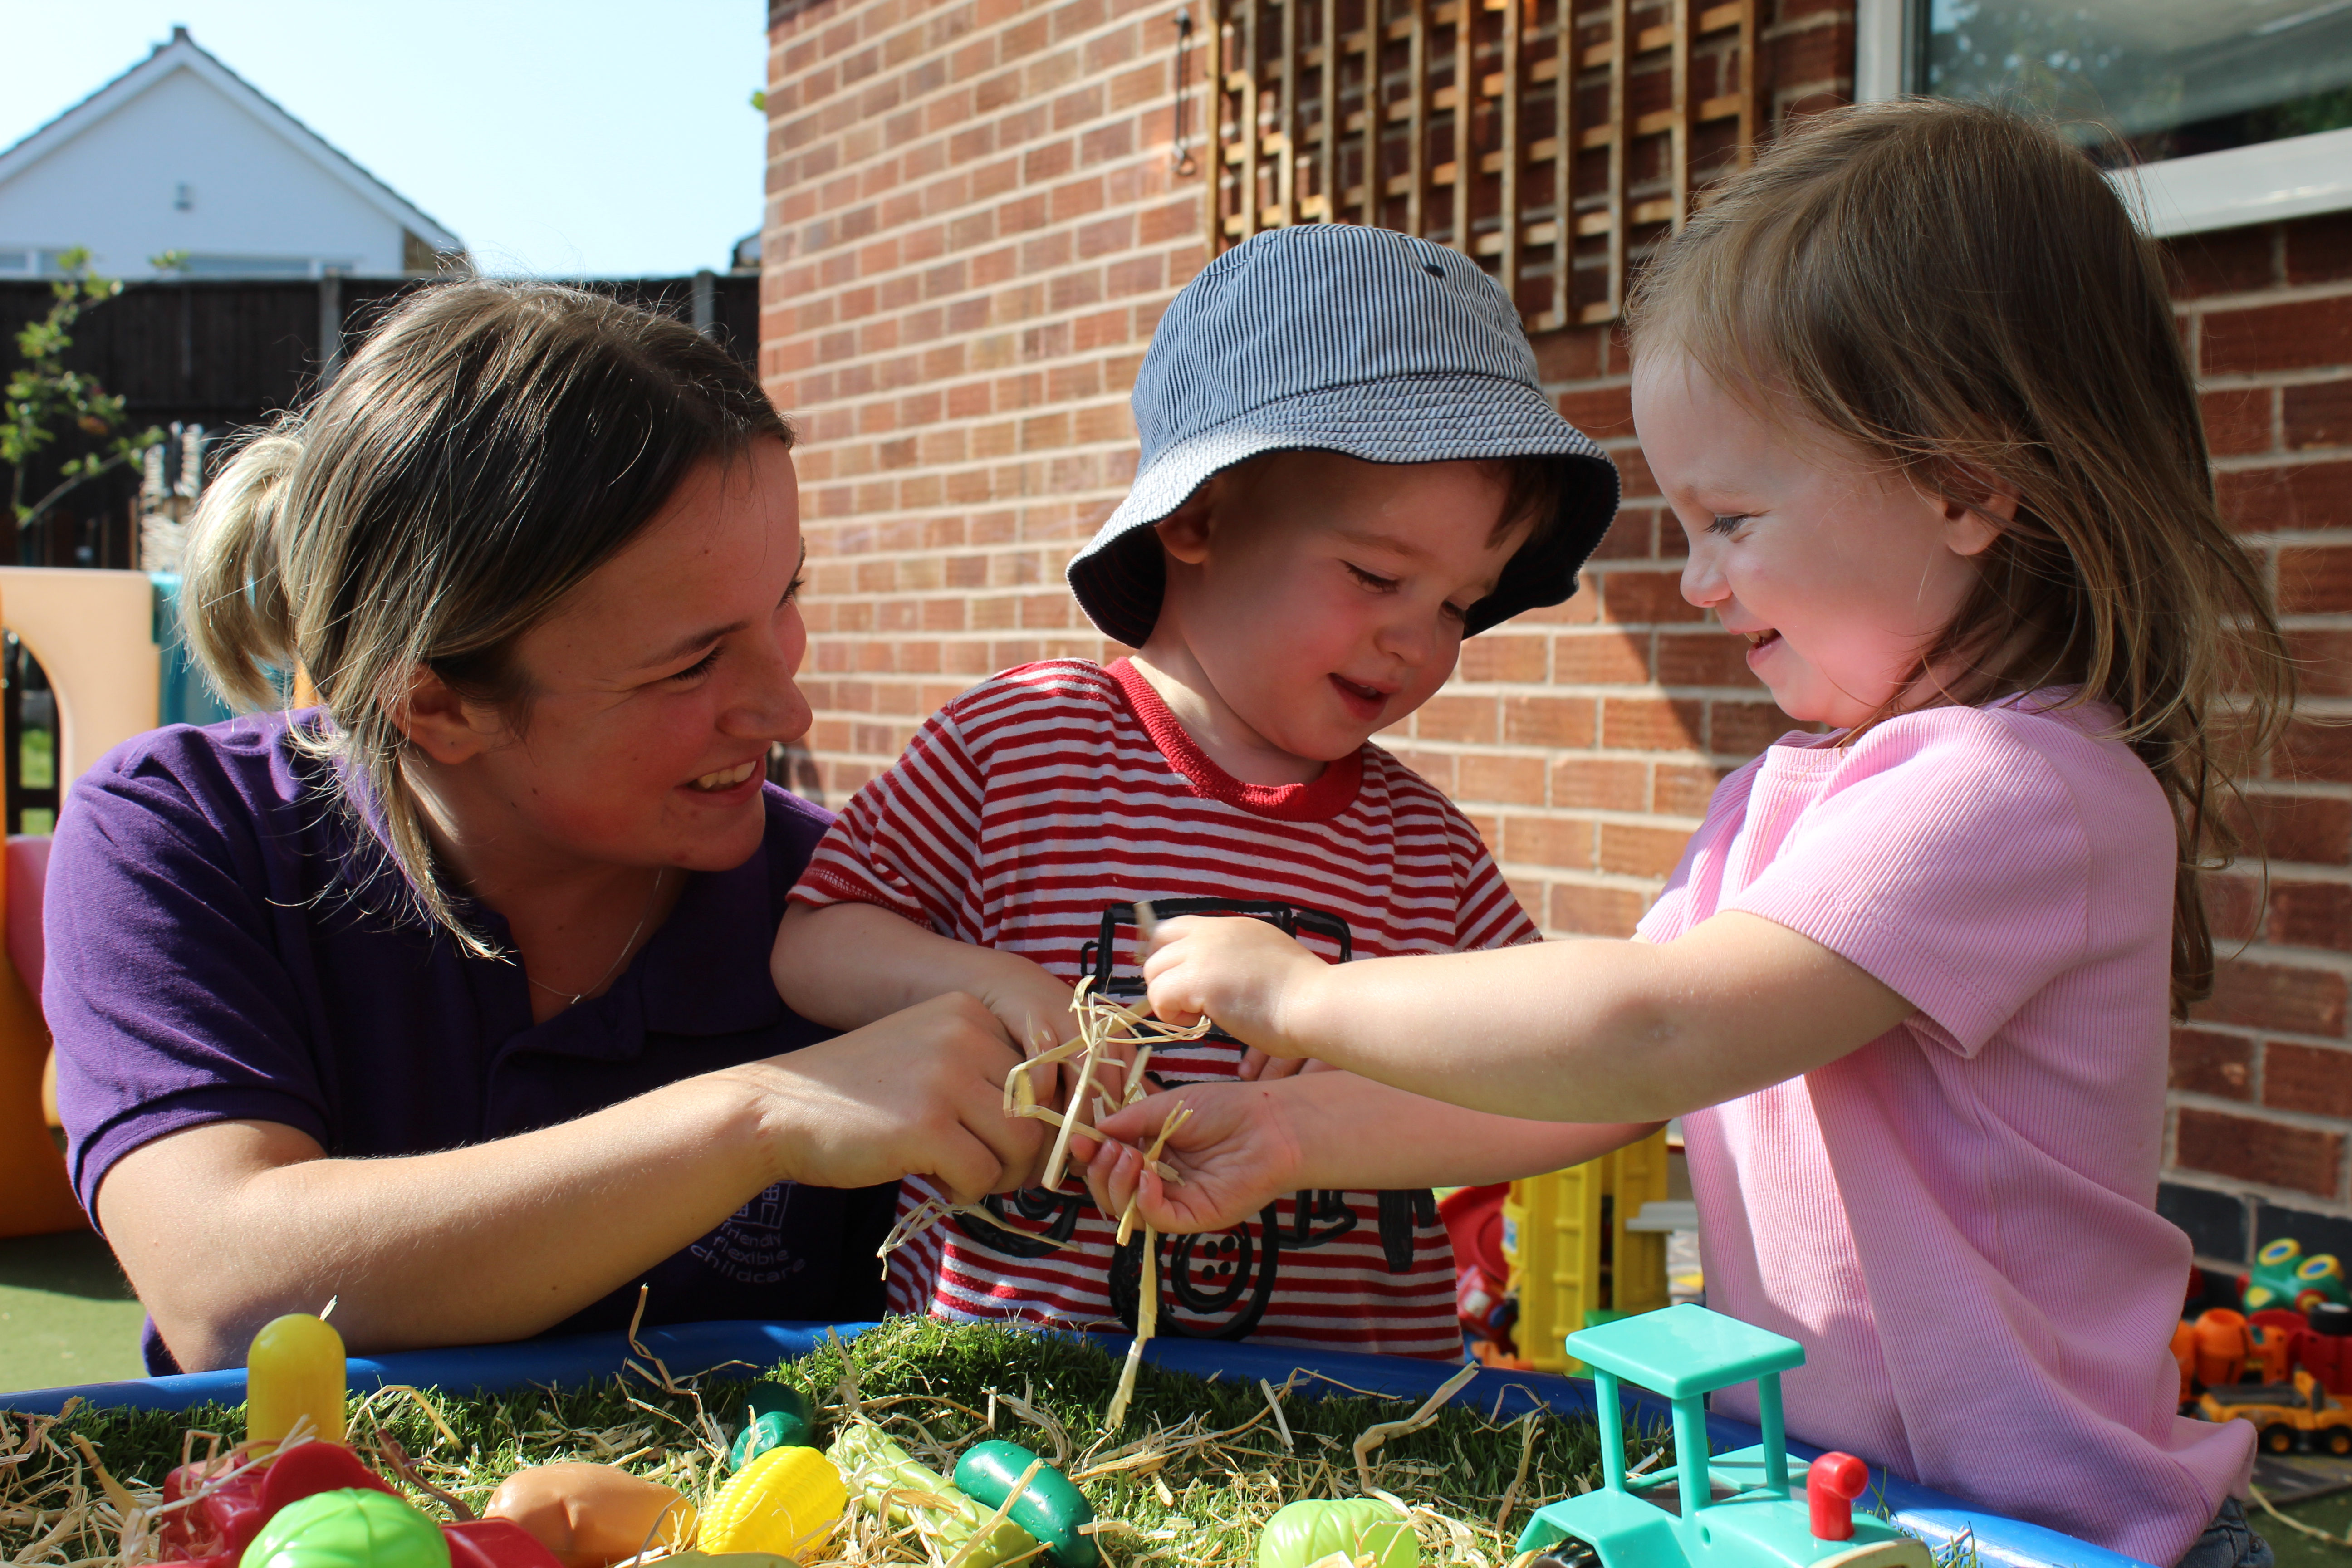 How nursery helps your child's social development